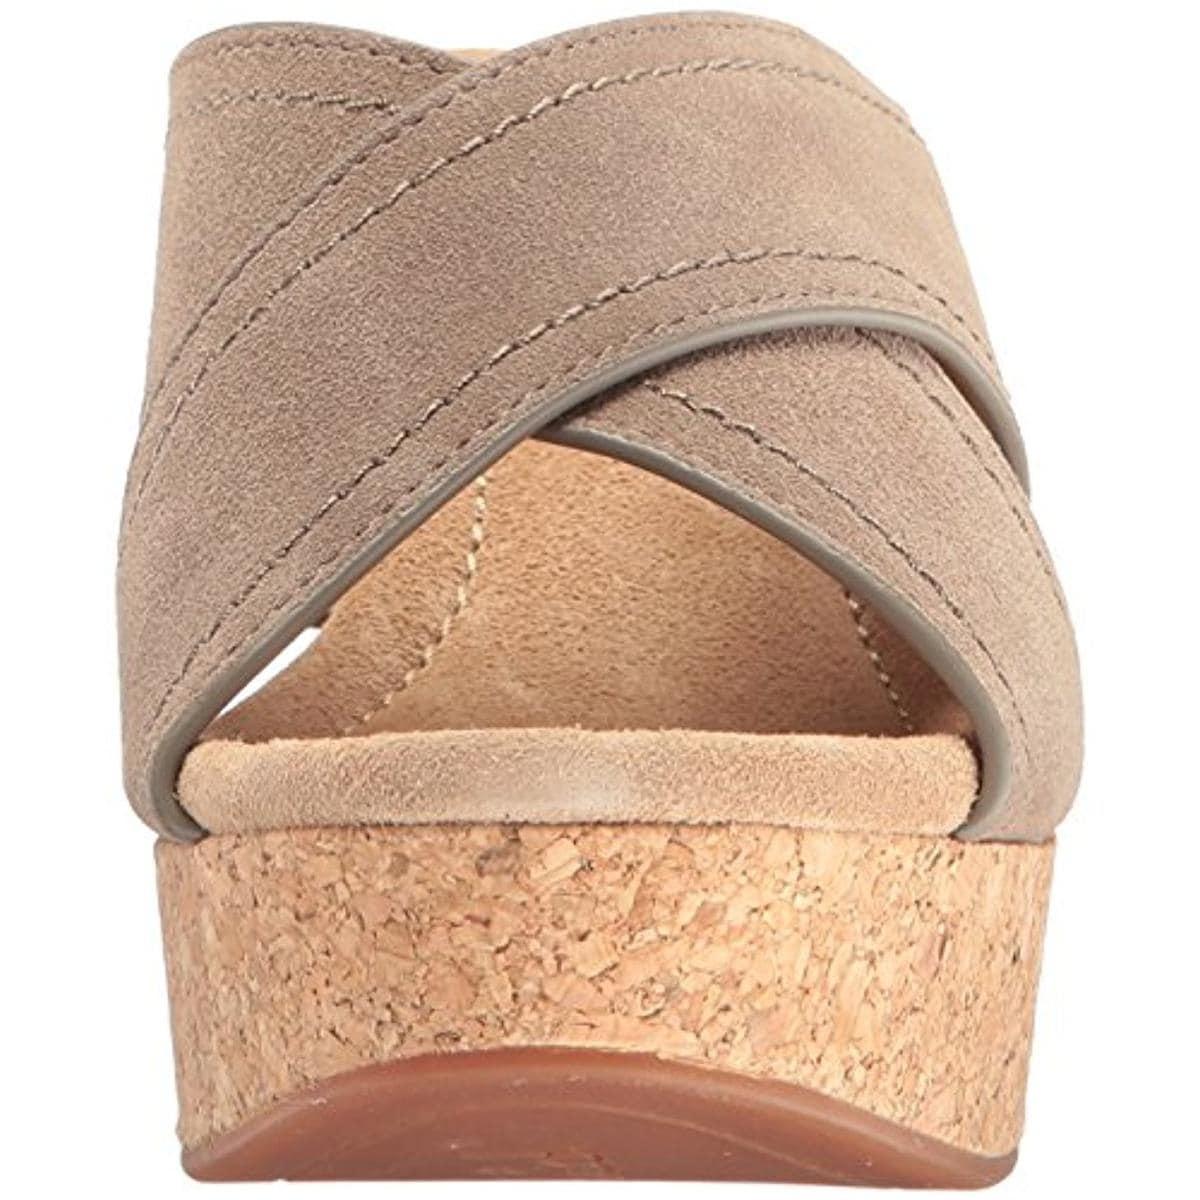 47aa455b551 Shop Splendid Womens Joan Wedge Sandals Cork Open Toe - On Sale - Free  Shipping On Orders Over  45 - Overstock.com - 21490728